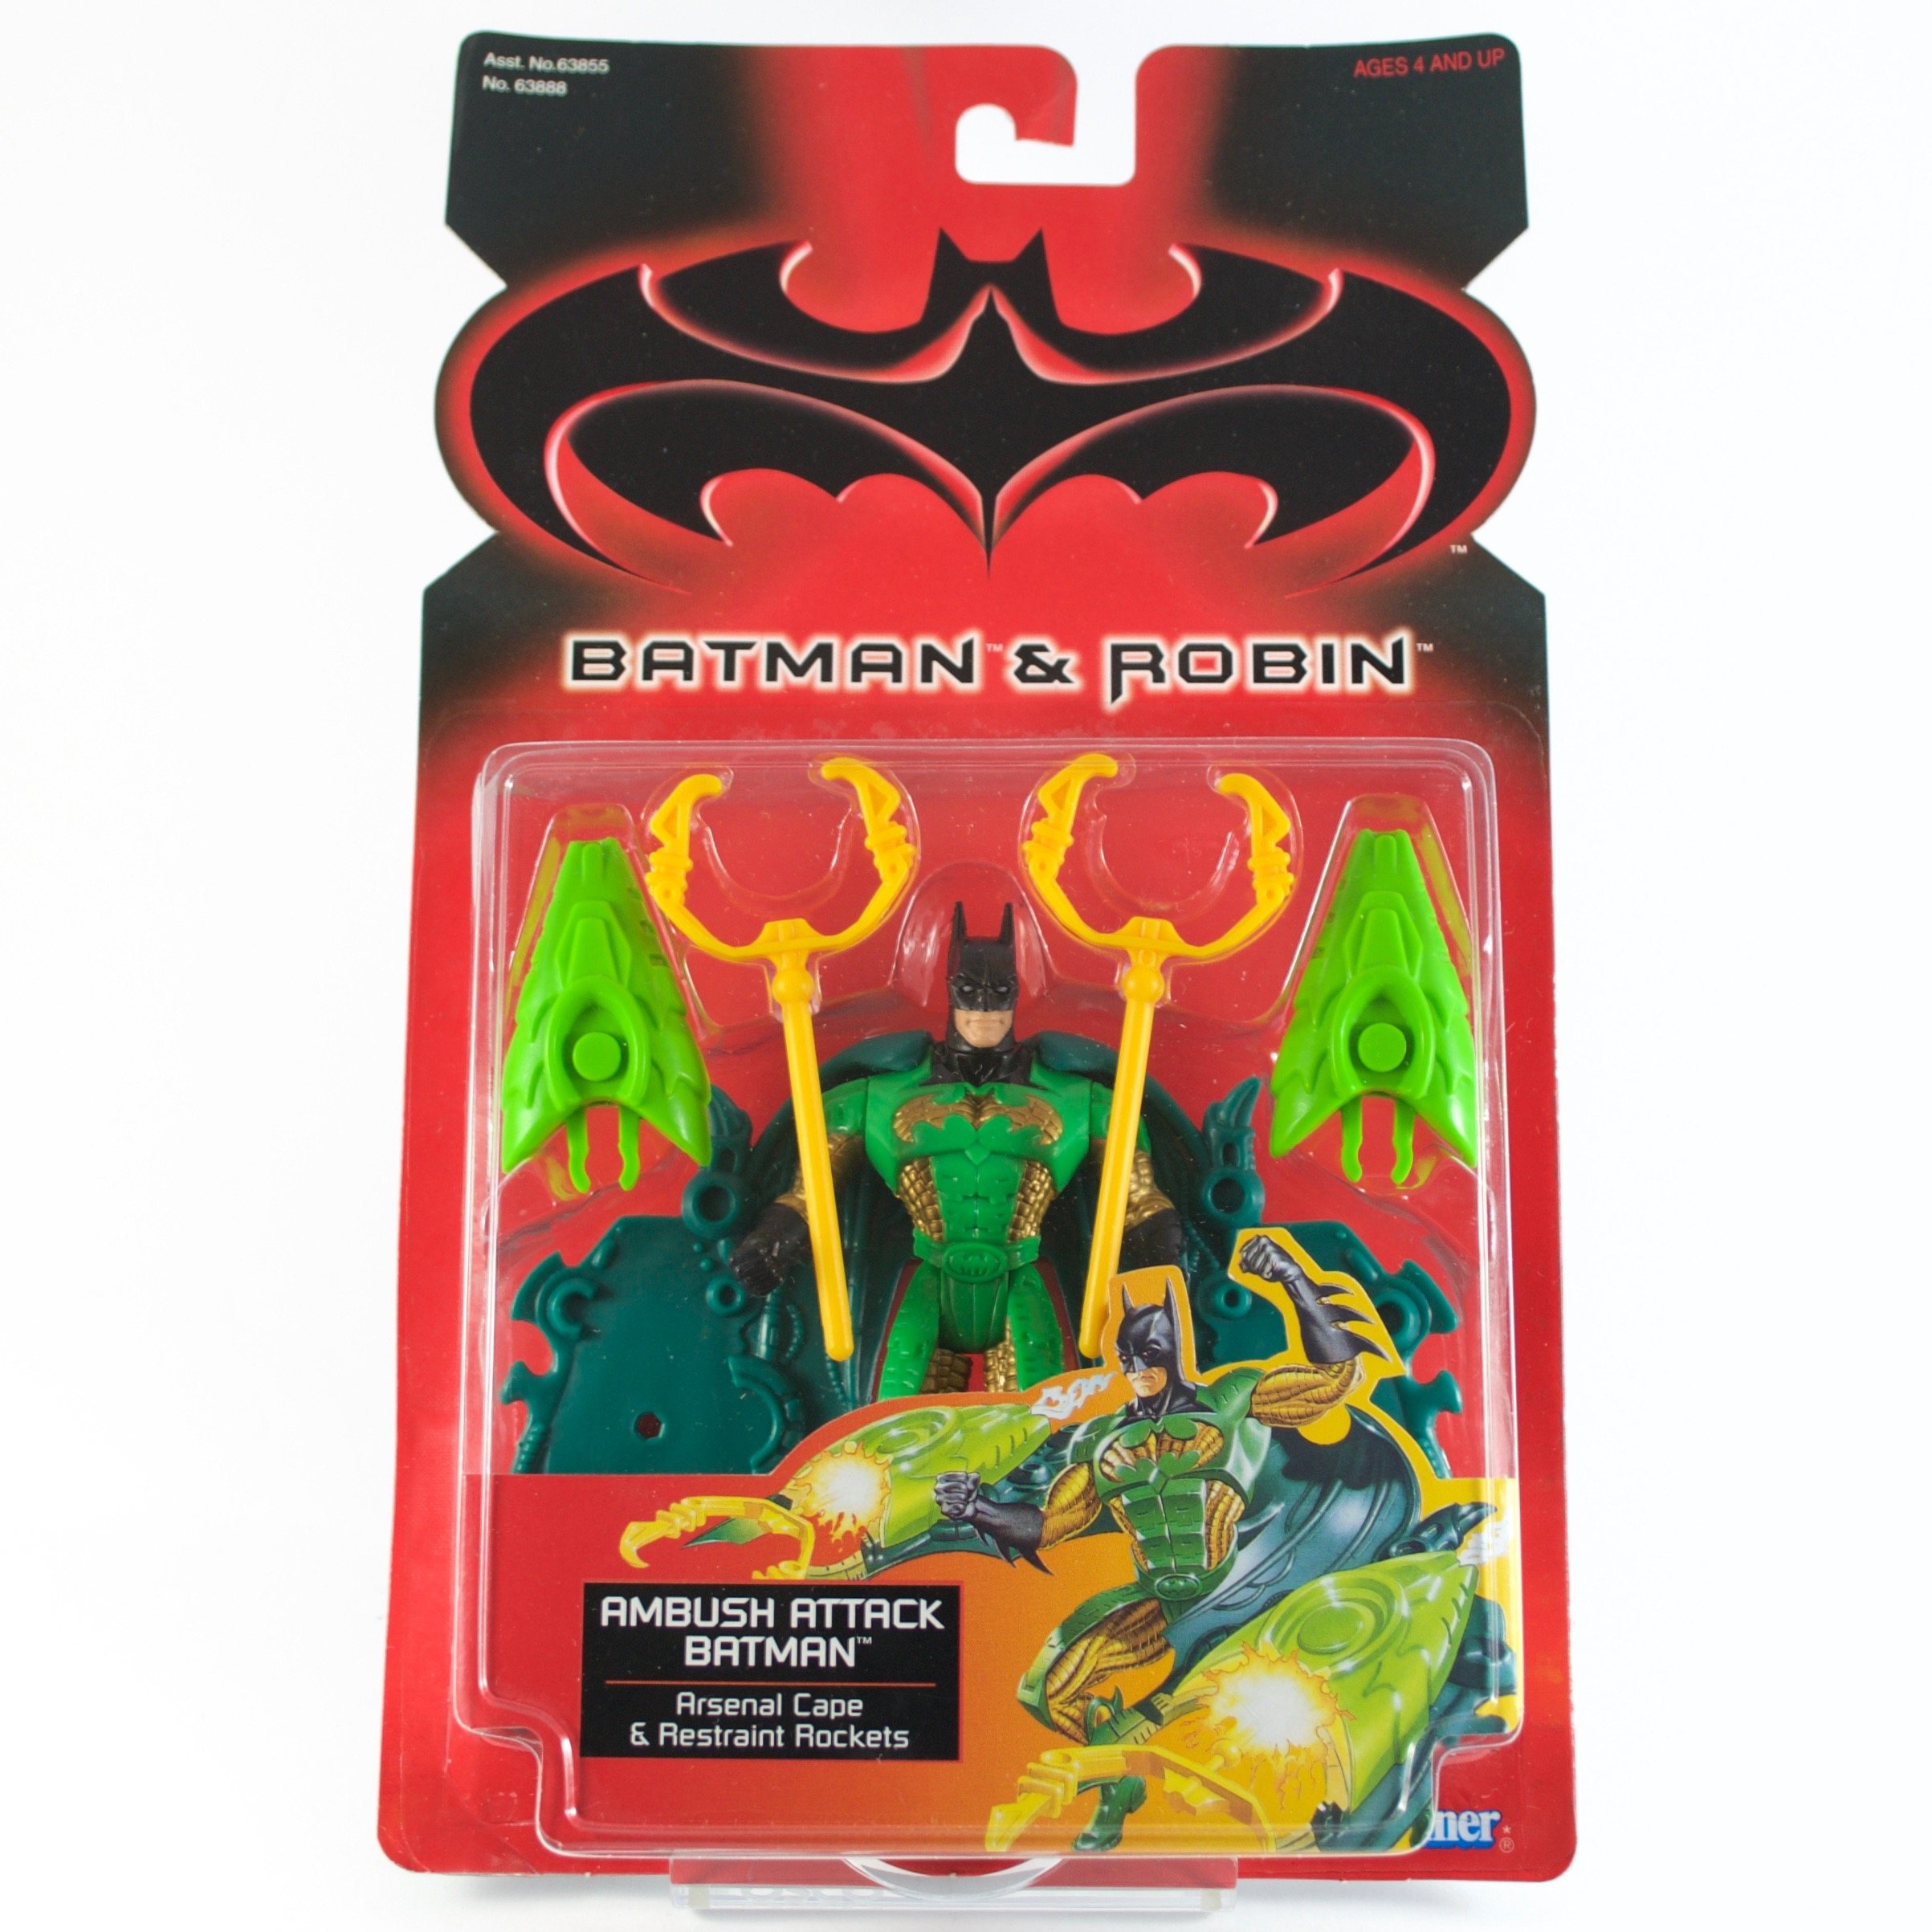 batman_ambush_attack_2.jpeg